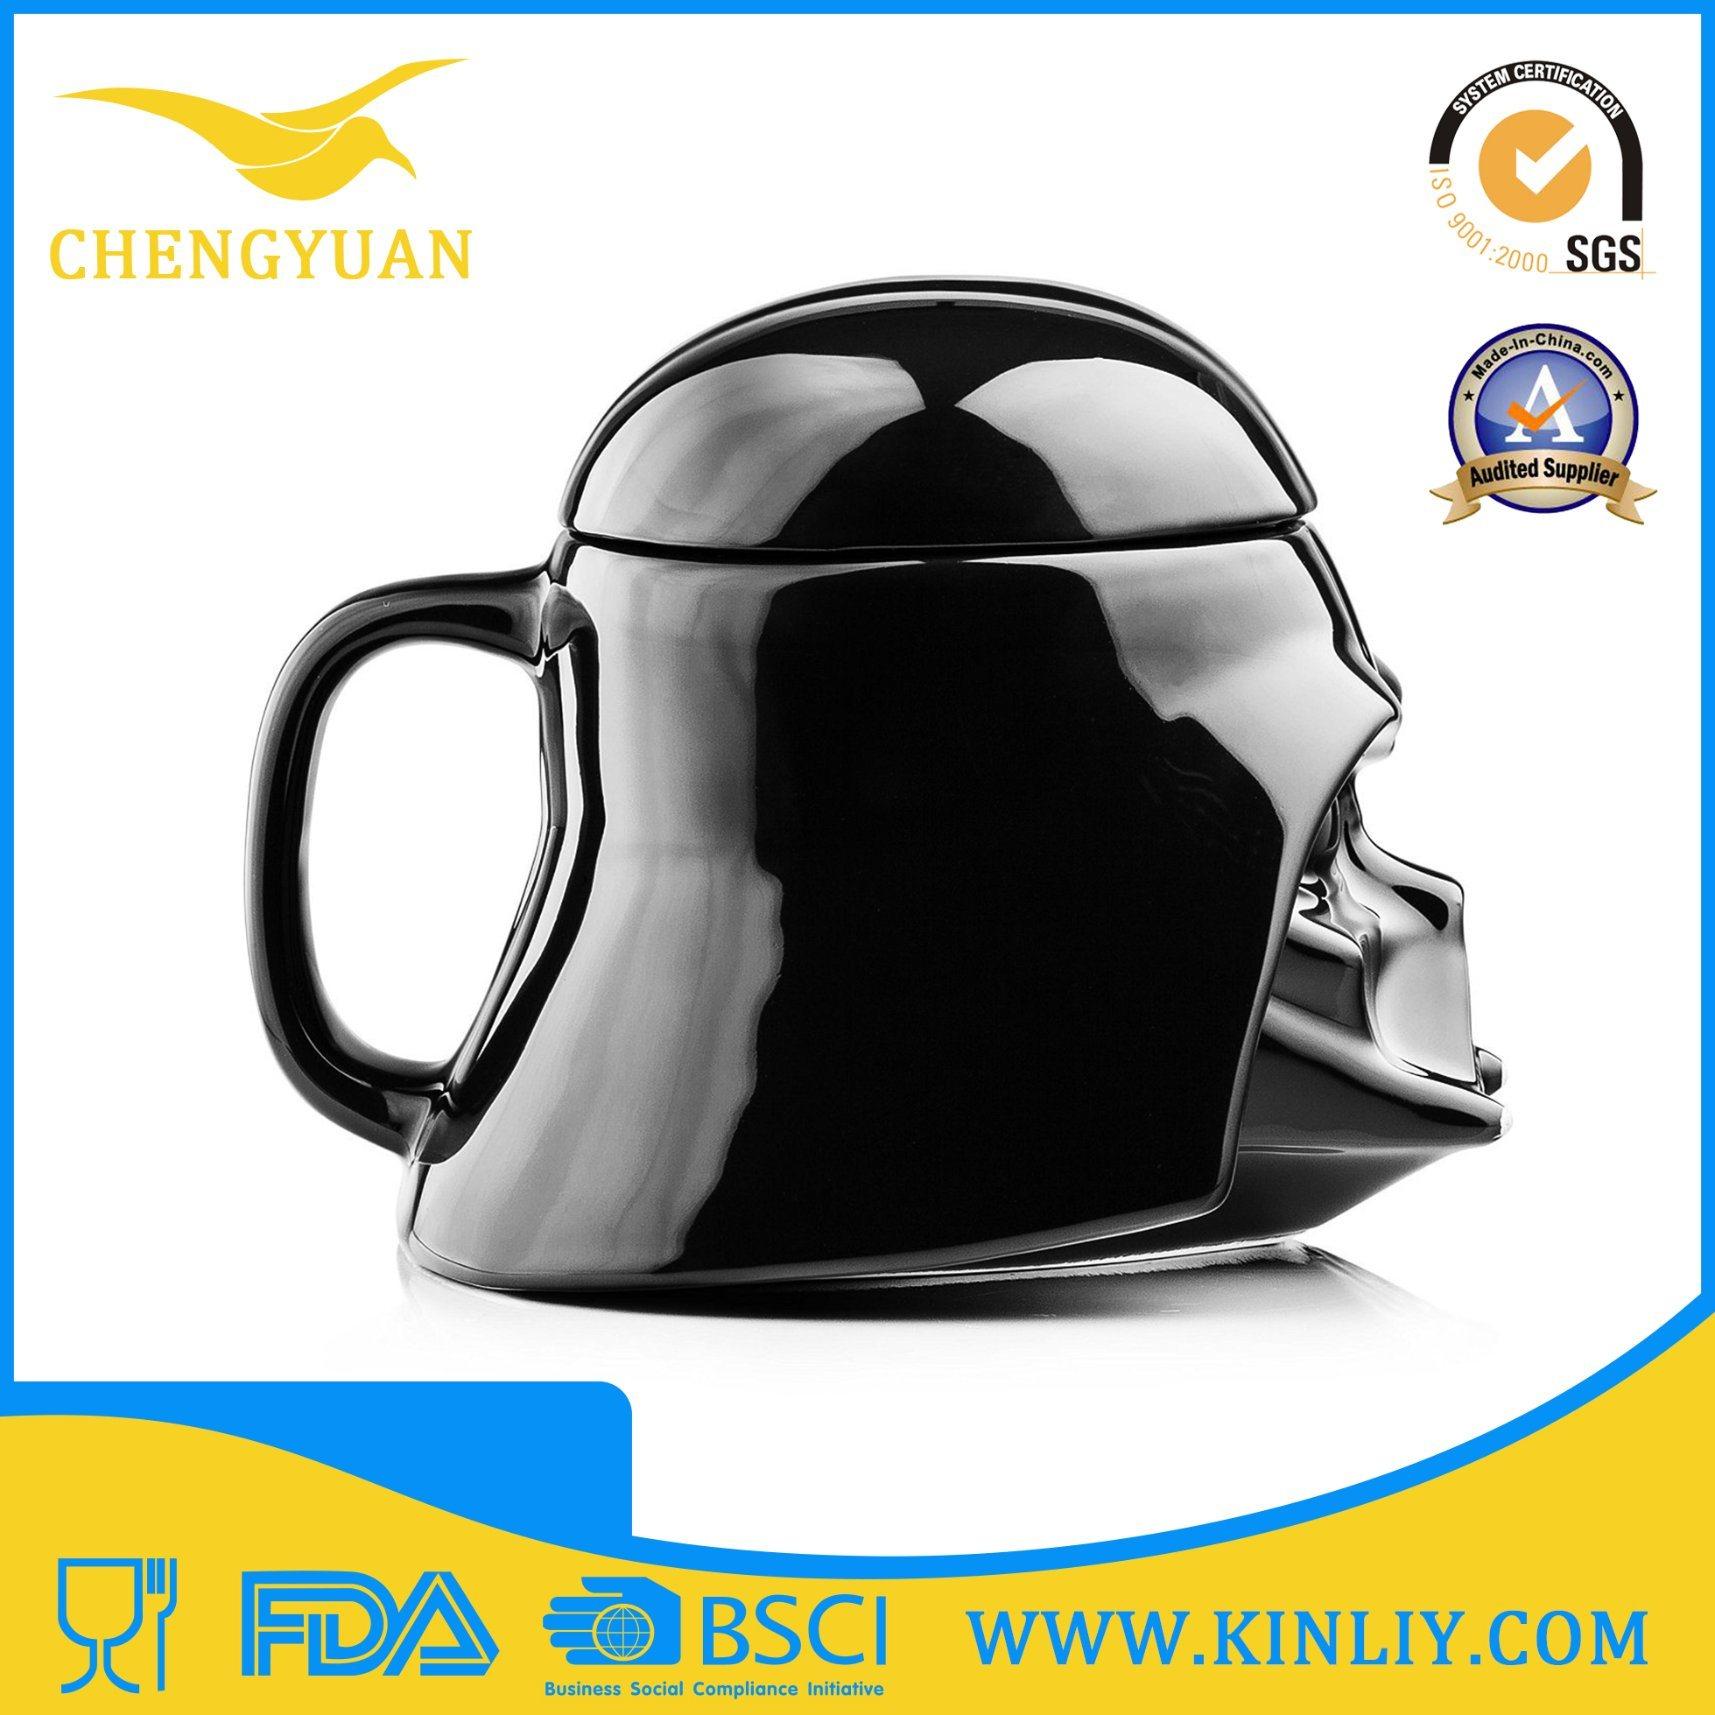 Cheap Ceramic Star Wars Tea Cup Coffee Mug with Lid